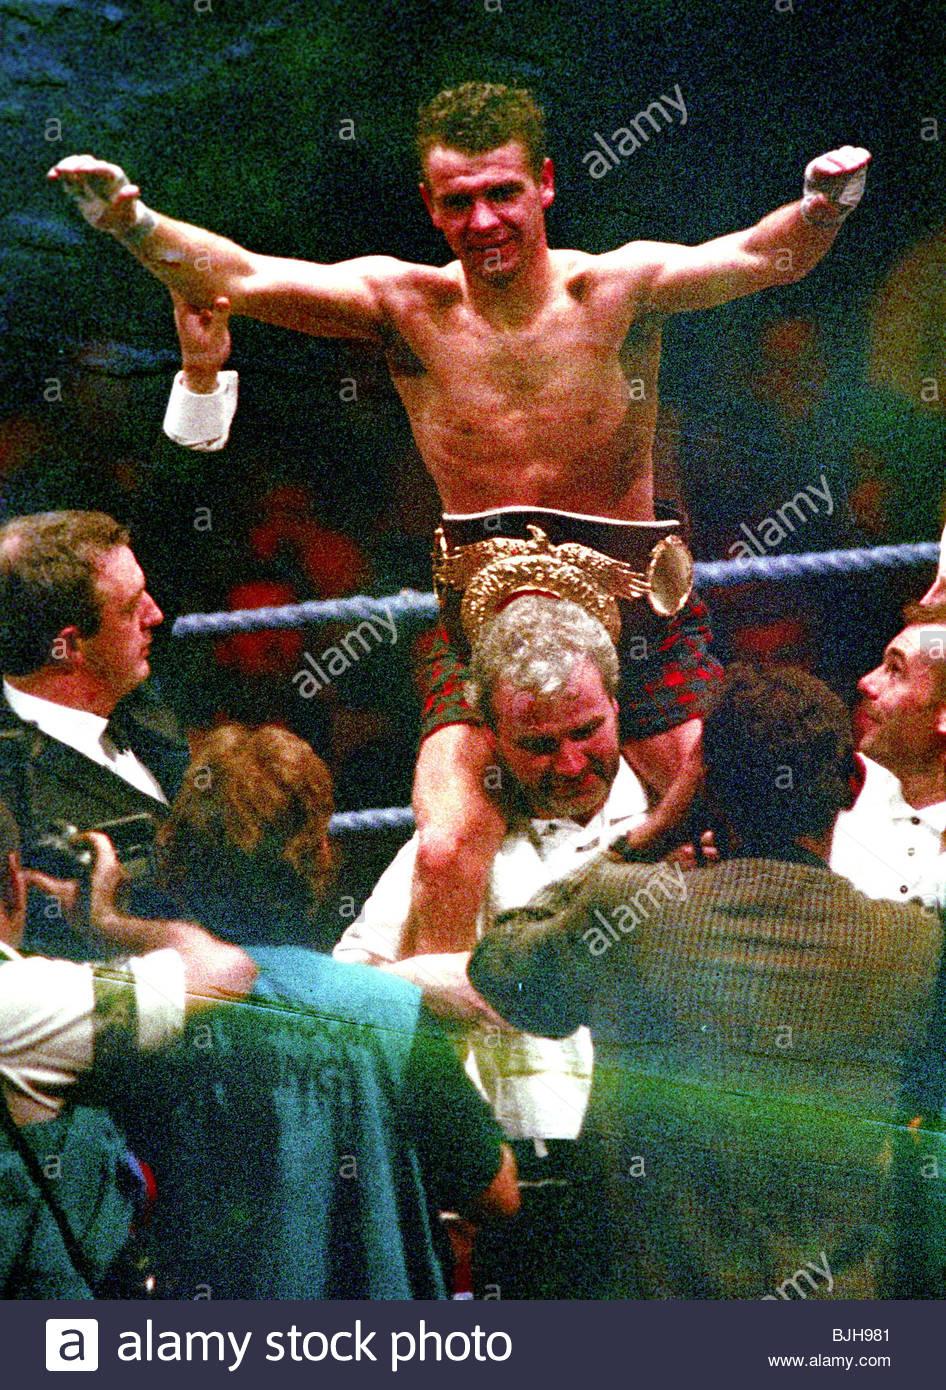 19/09/92 WBO FLYWEIGHT CHAMPIONSHIP Pat CLINTON (SCO) V Danny PORTER (ENG) SECC - GLASGOW Pat Clinton celebrates - Stock Image